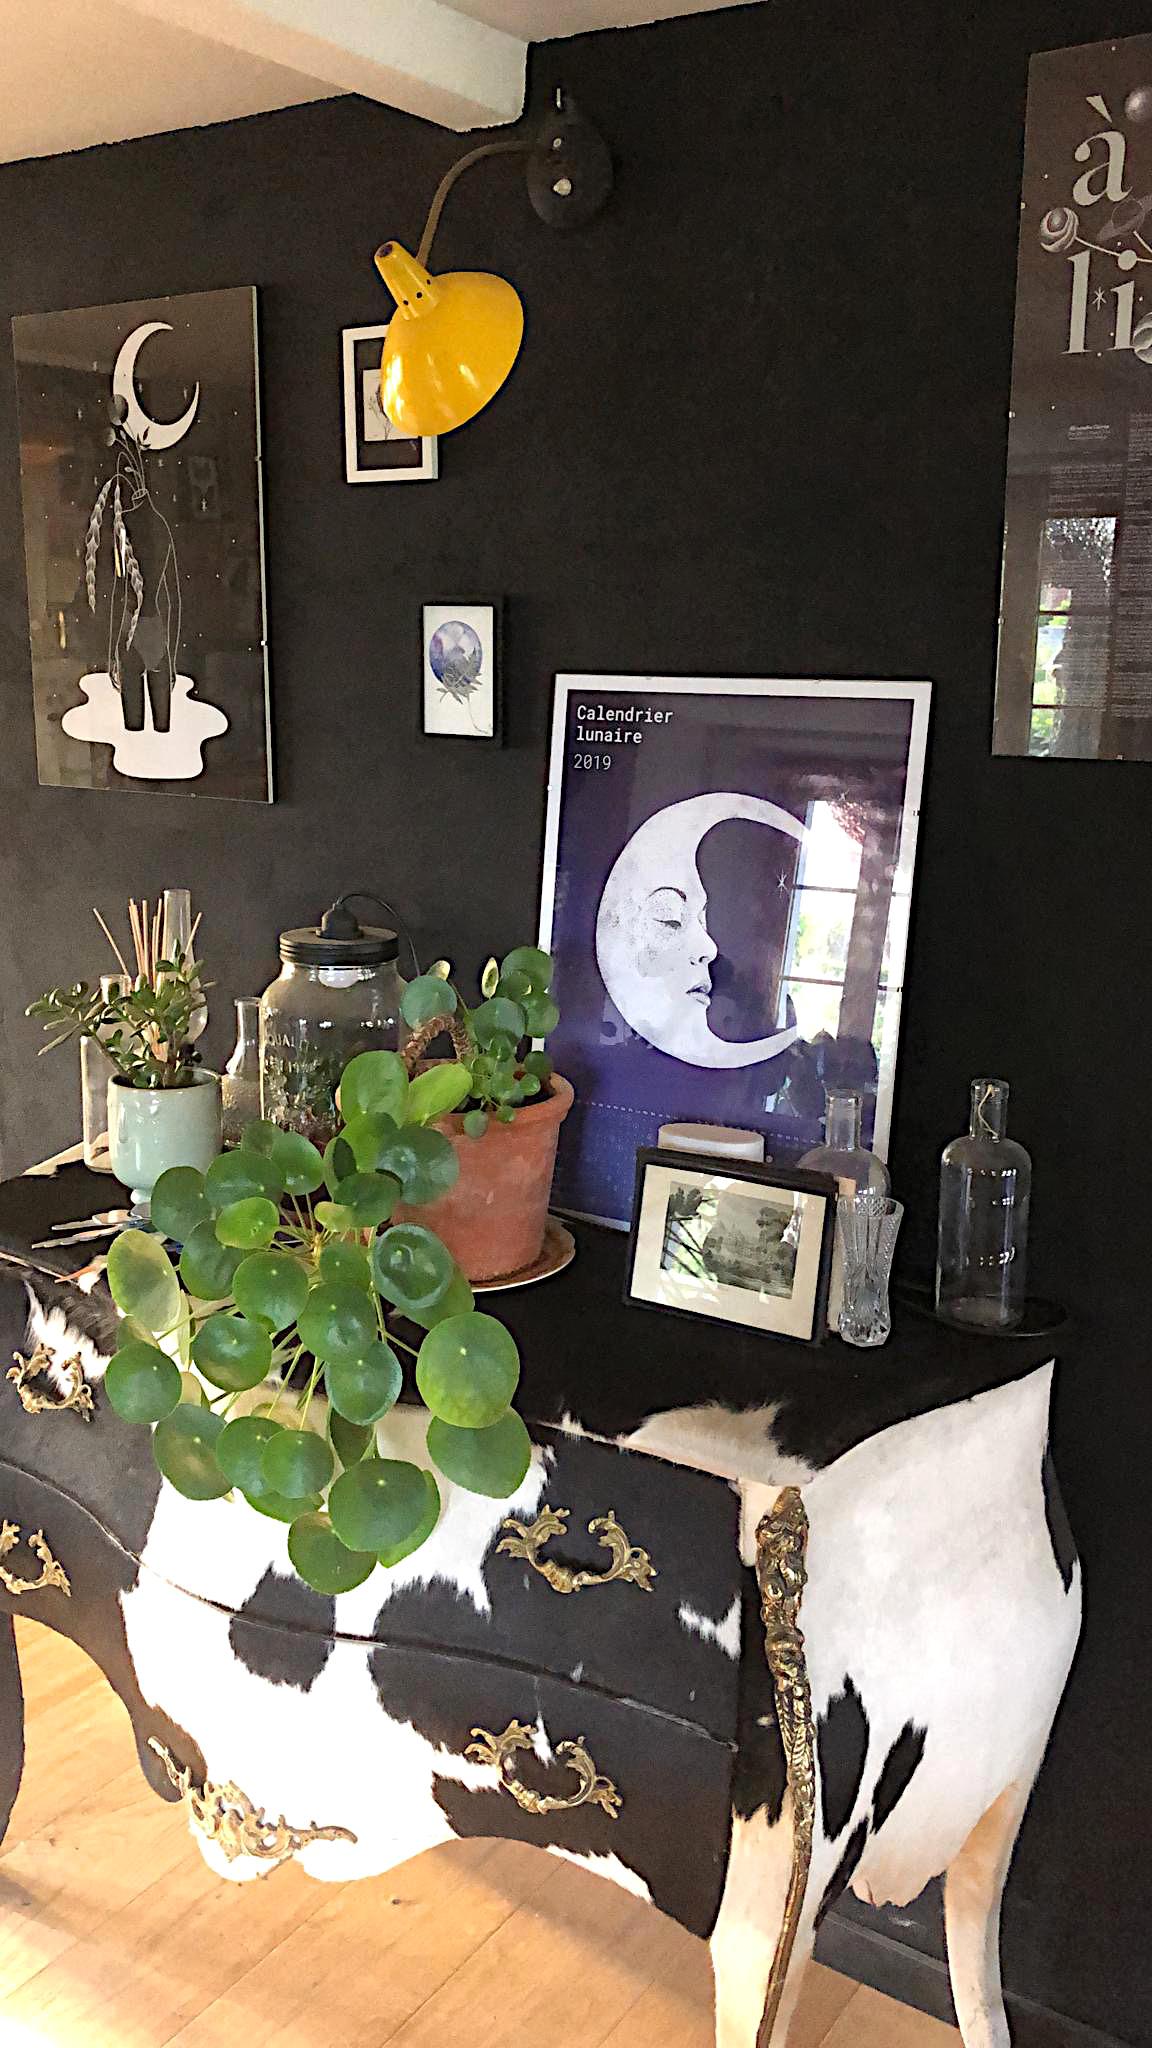 Aquarelle noiram mlam poncet la petite fleureuse judski pilea